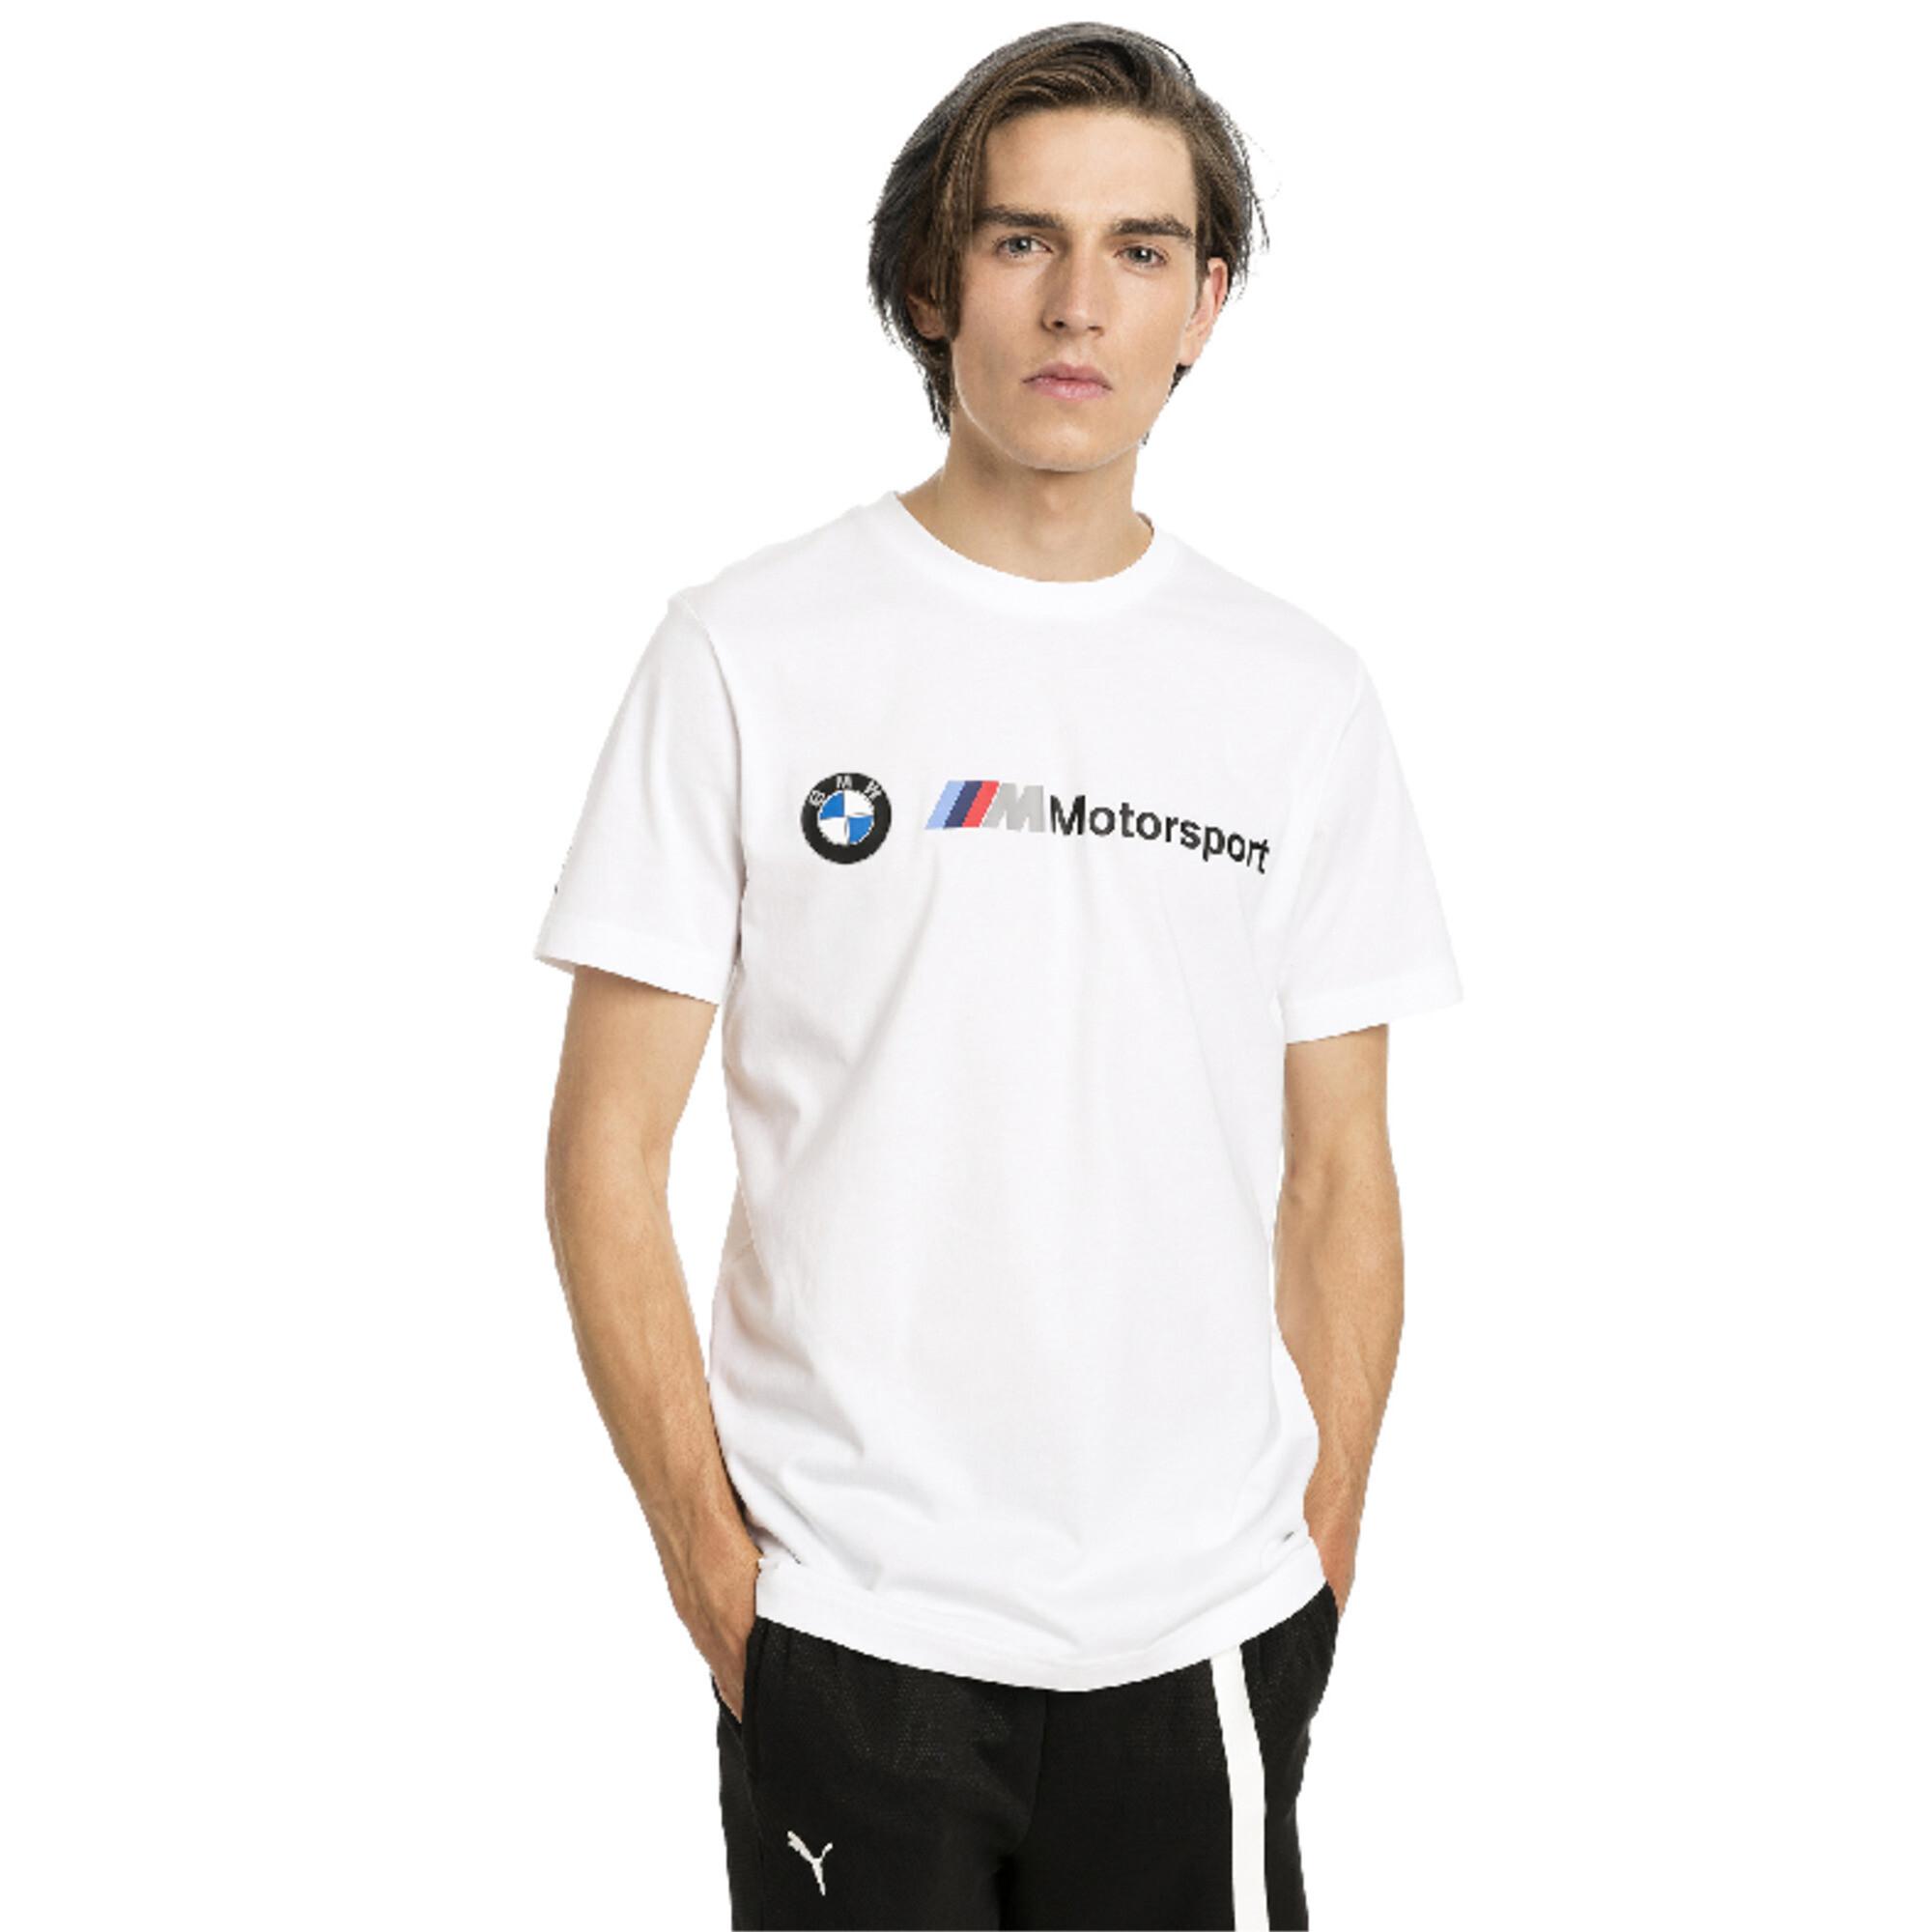 PUMA-BMW-M-Motorsport-Logo-Herren-T-Shirt-Maenner-T-Shirt-Neu Indexbild 9